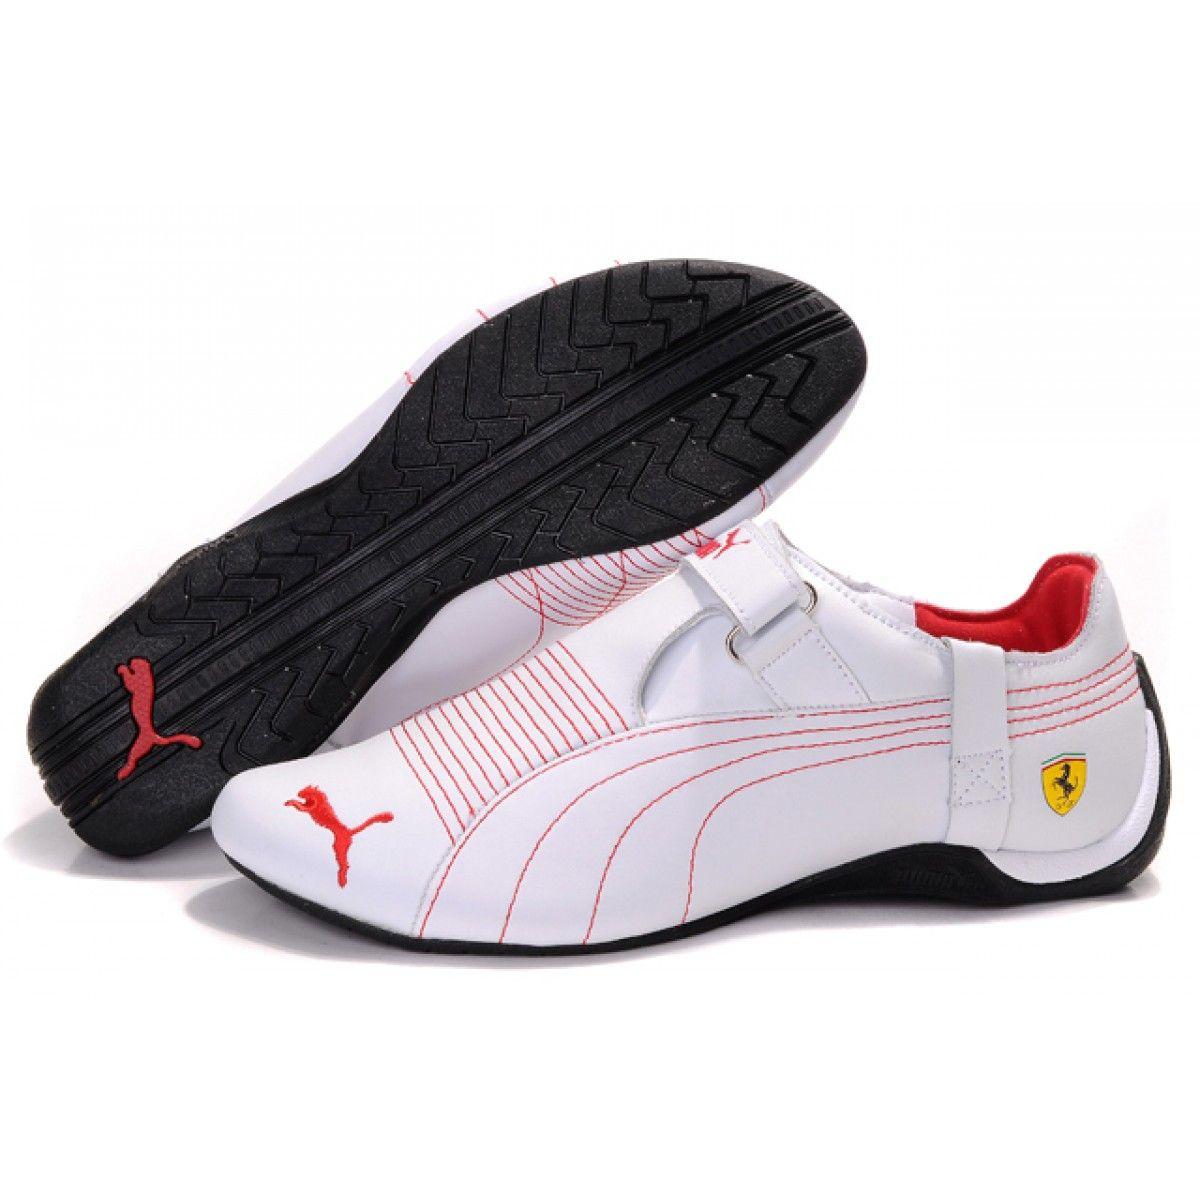 Puma Future Cat Ferrari Mesh Black Red Shoespuma king football bootsincredible prices